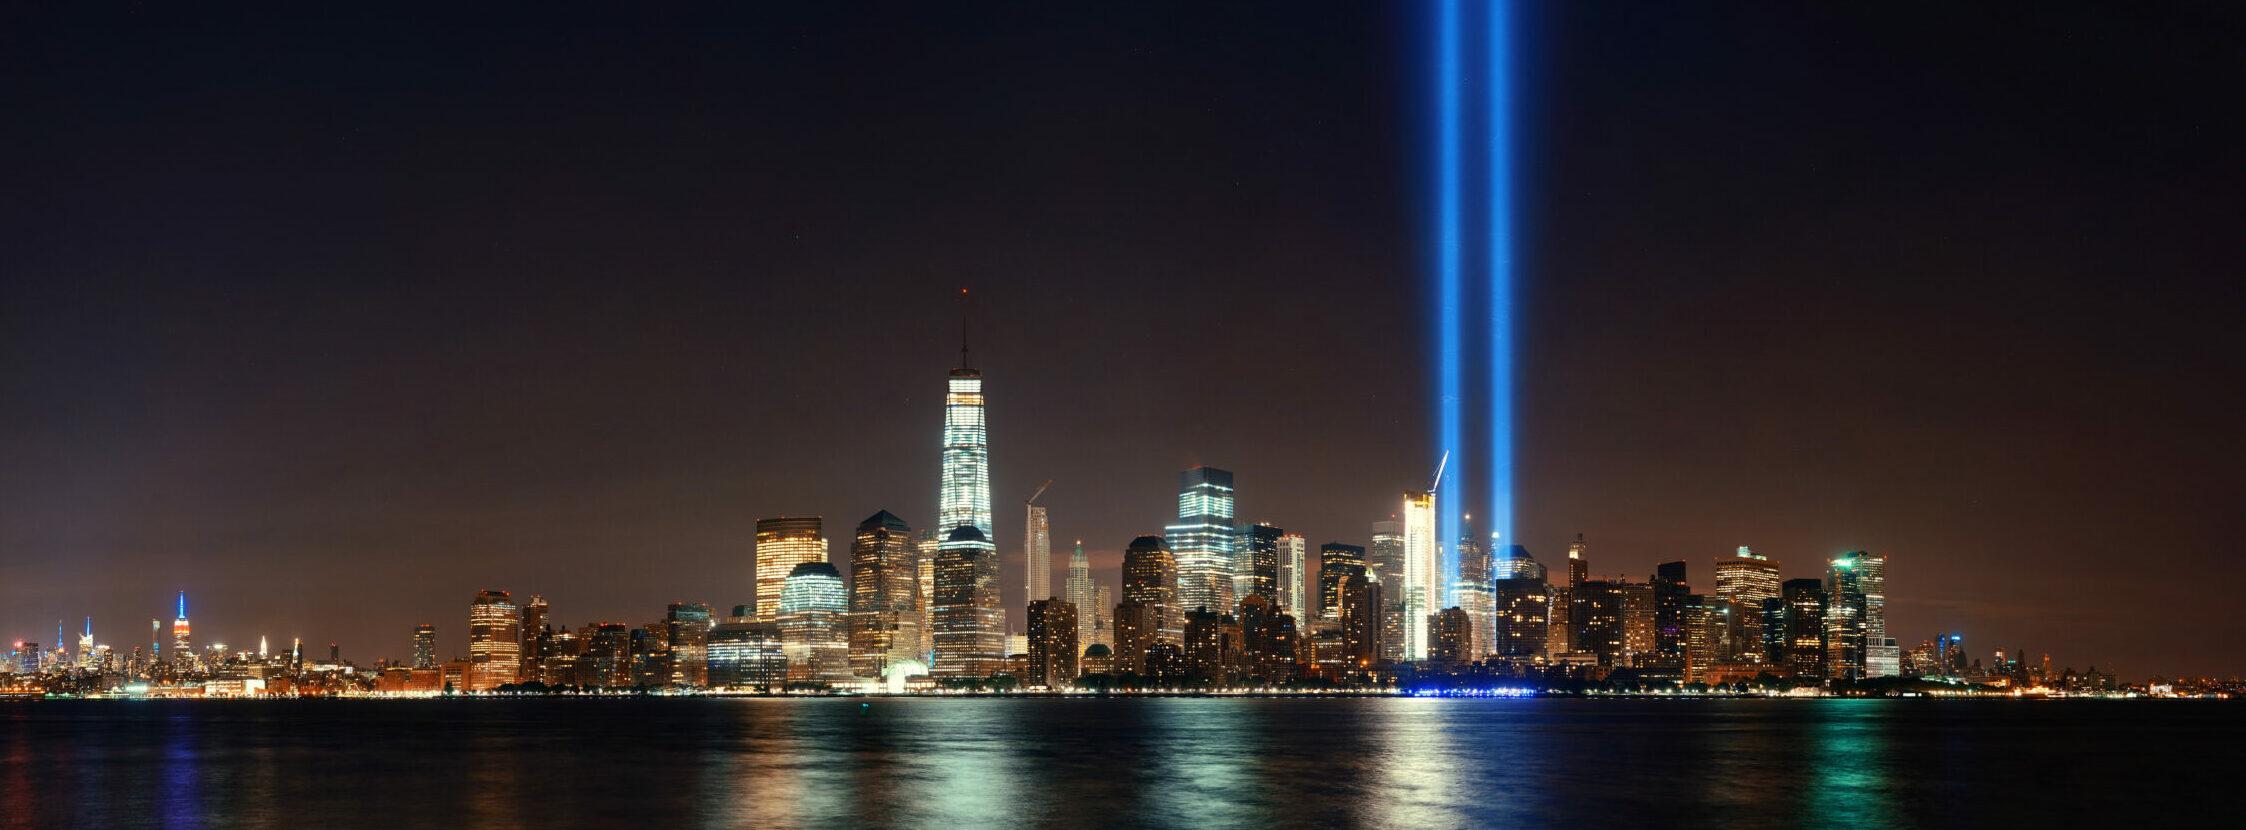 I Remember: 9/11, Twenty Years Later